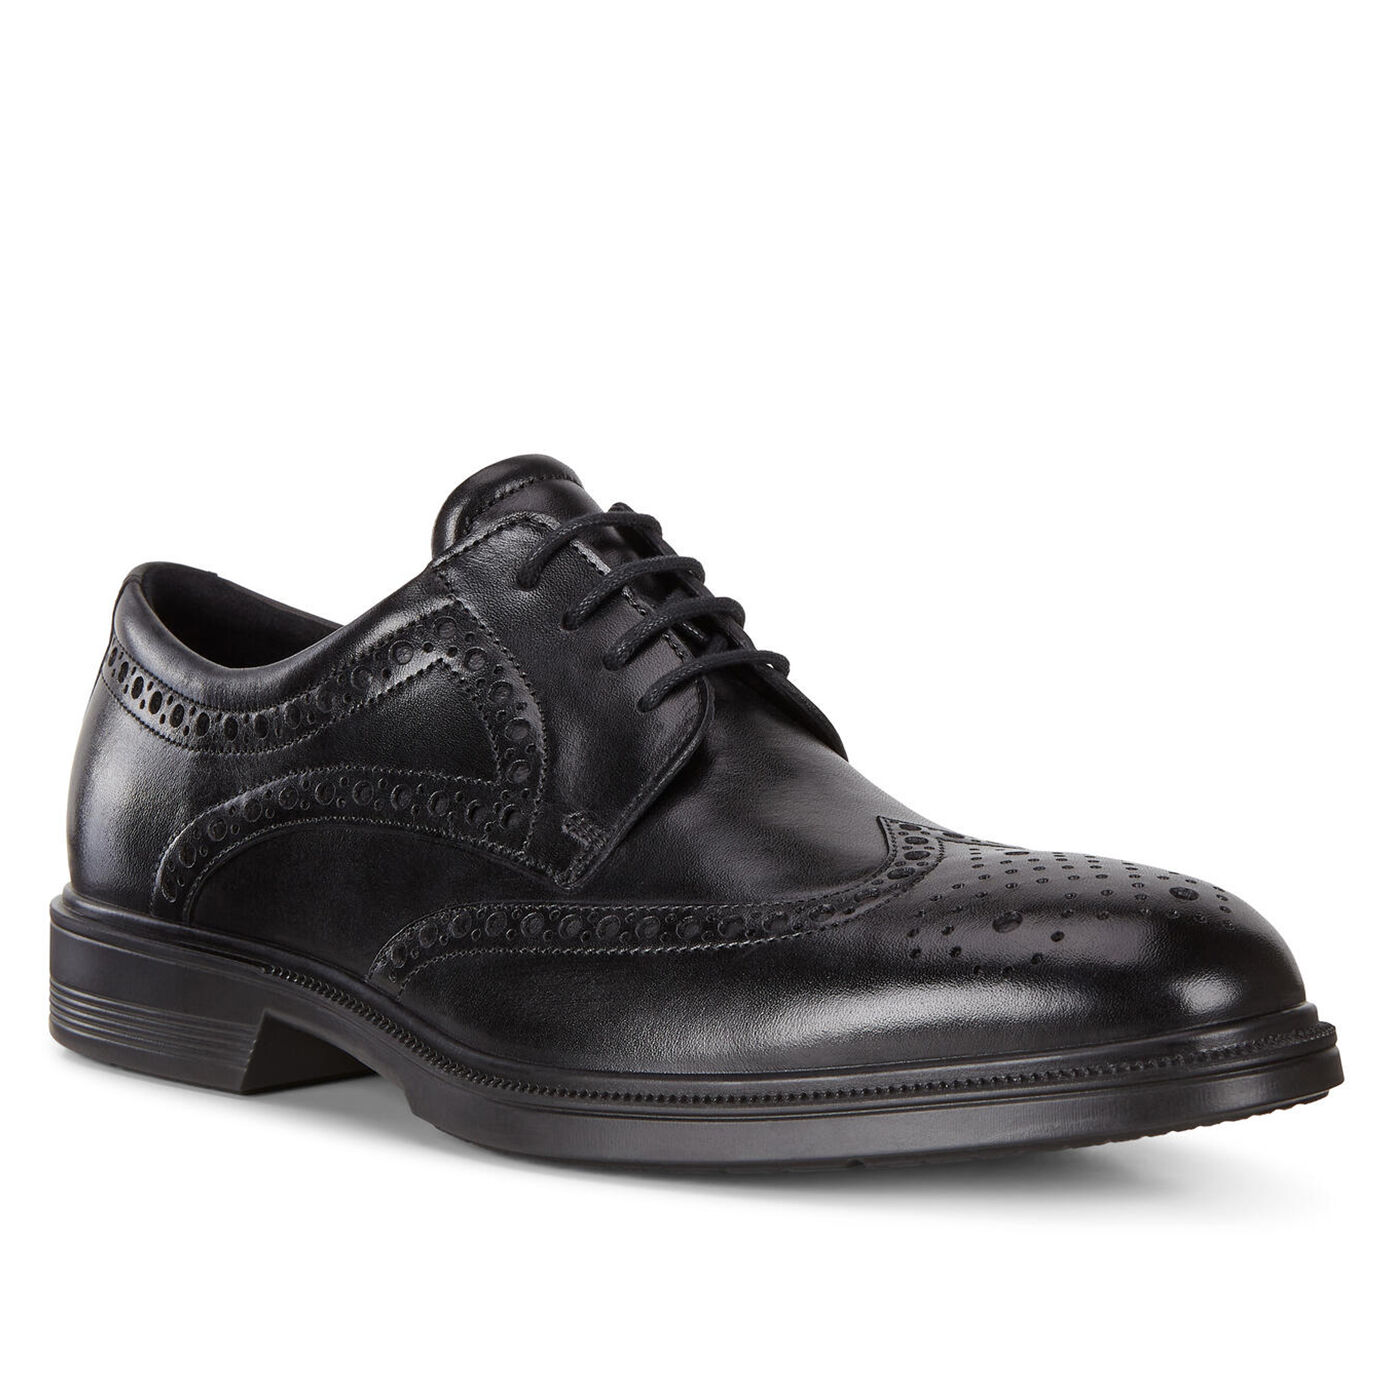 ECCO Maitland Mens Dress Shoe